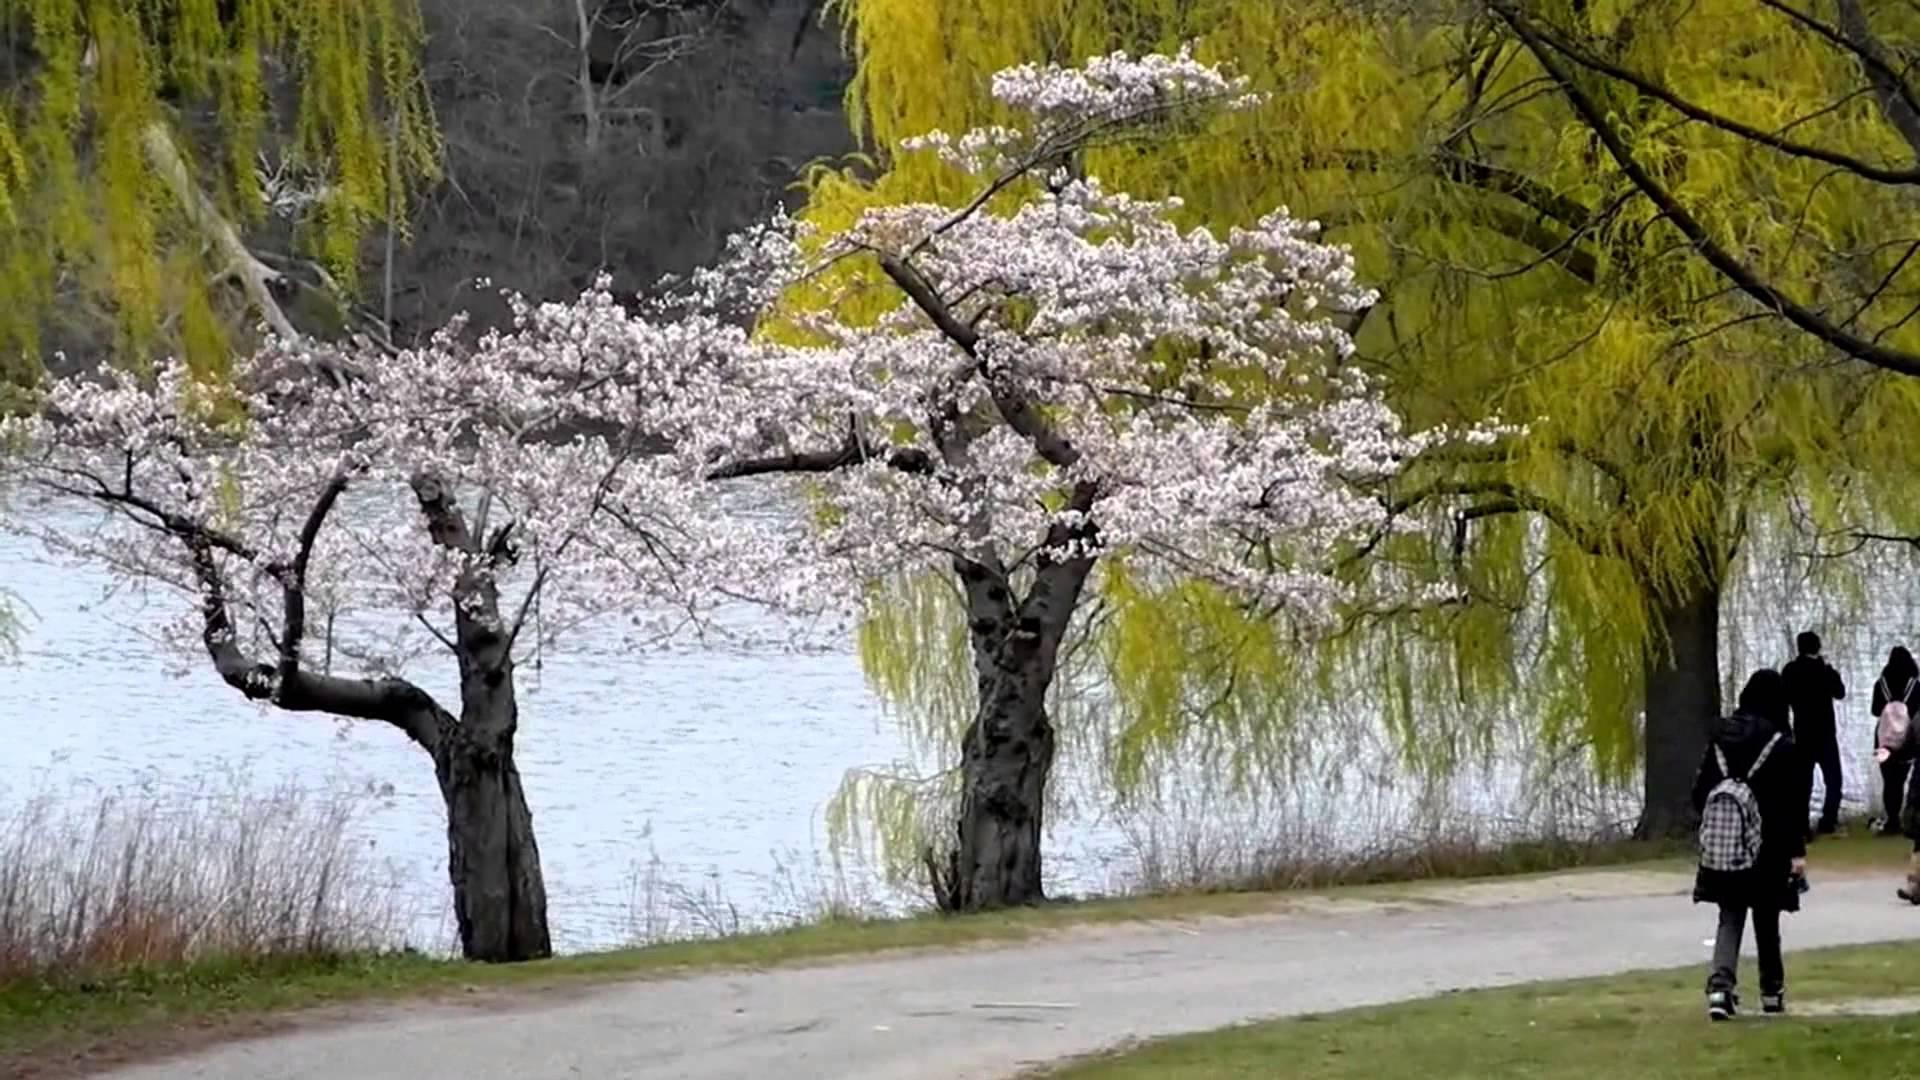 Happy Spring Flowering Trees-Blooming Trees in Happy Spring - YouTube